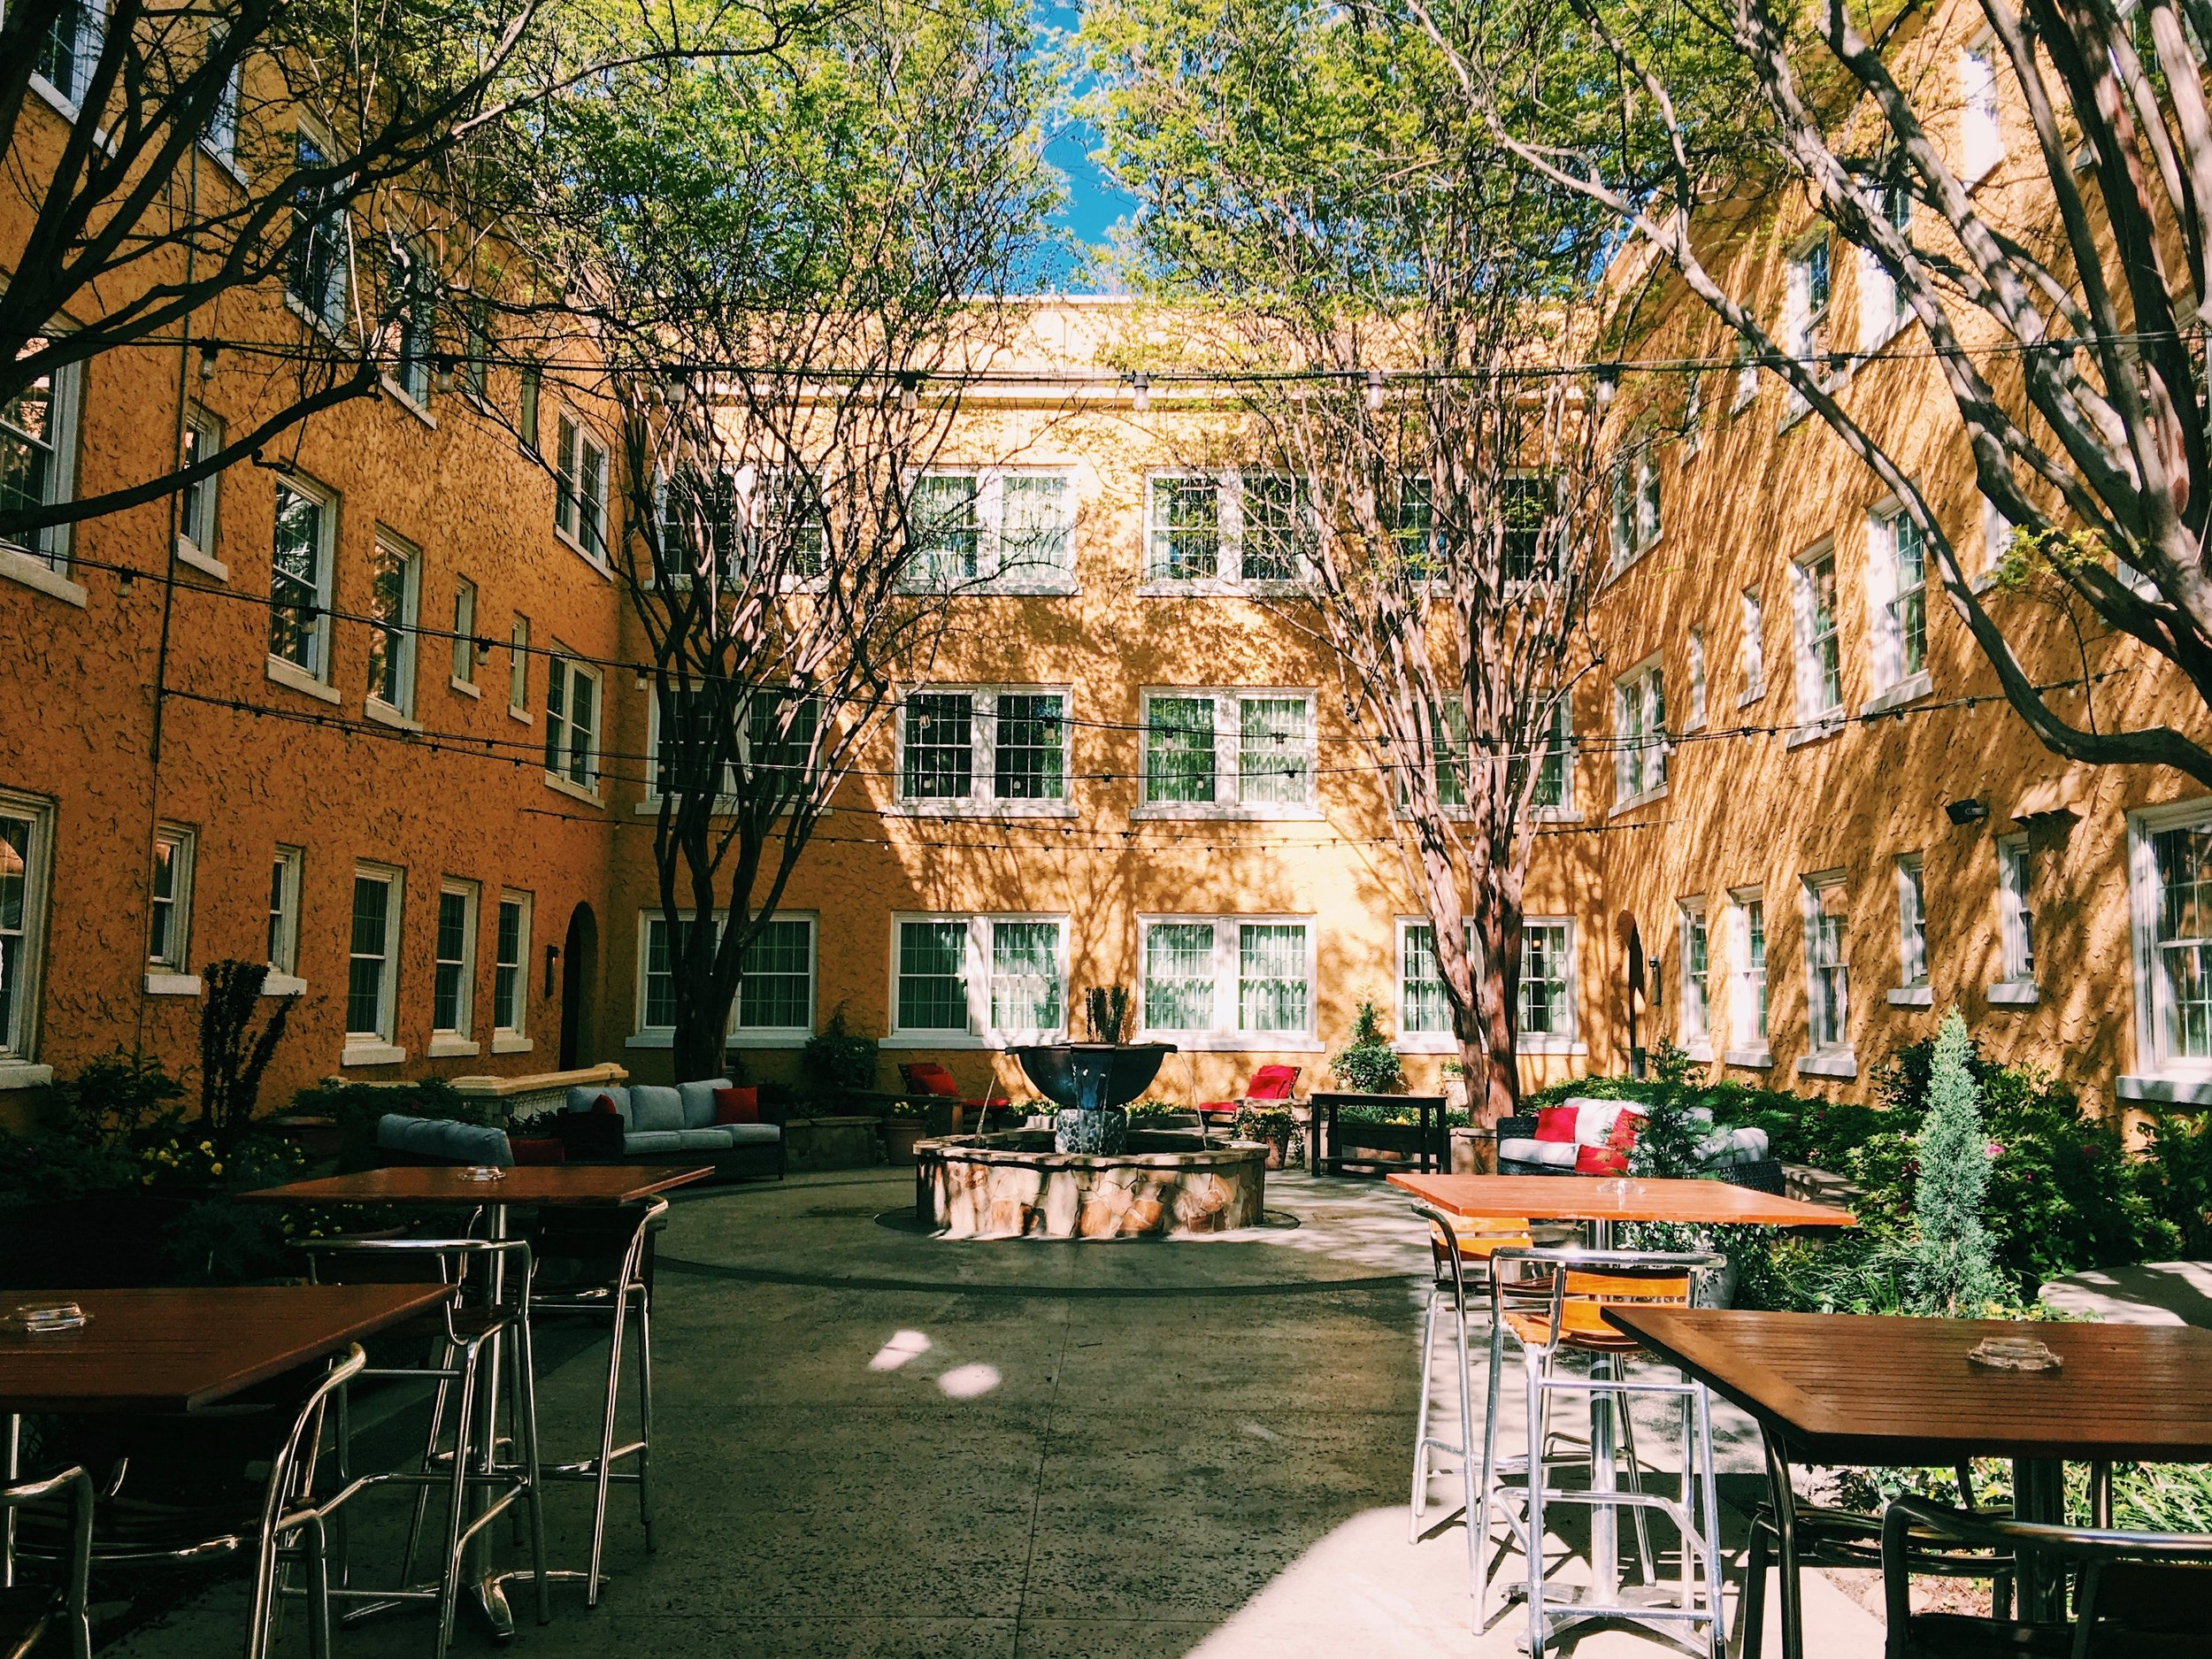 Artmore hotel courtyard in Midtown Atlanta